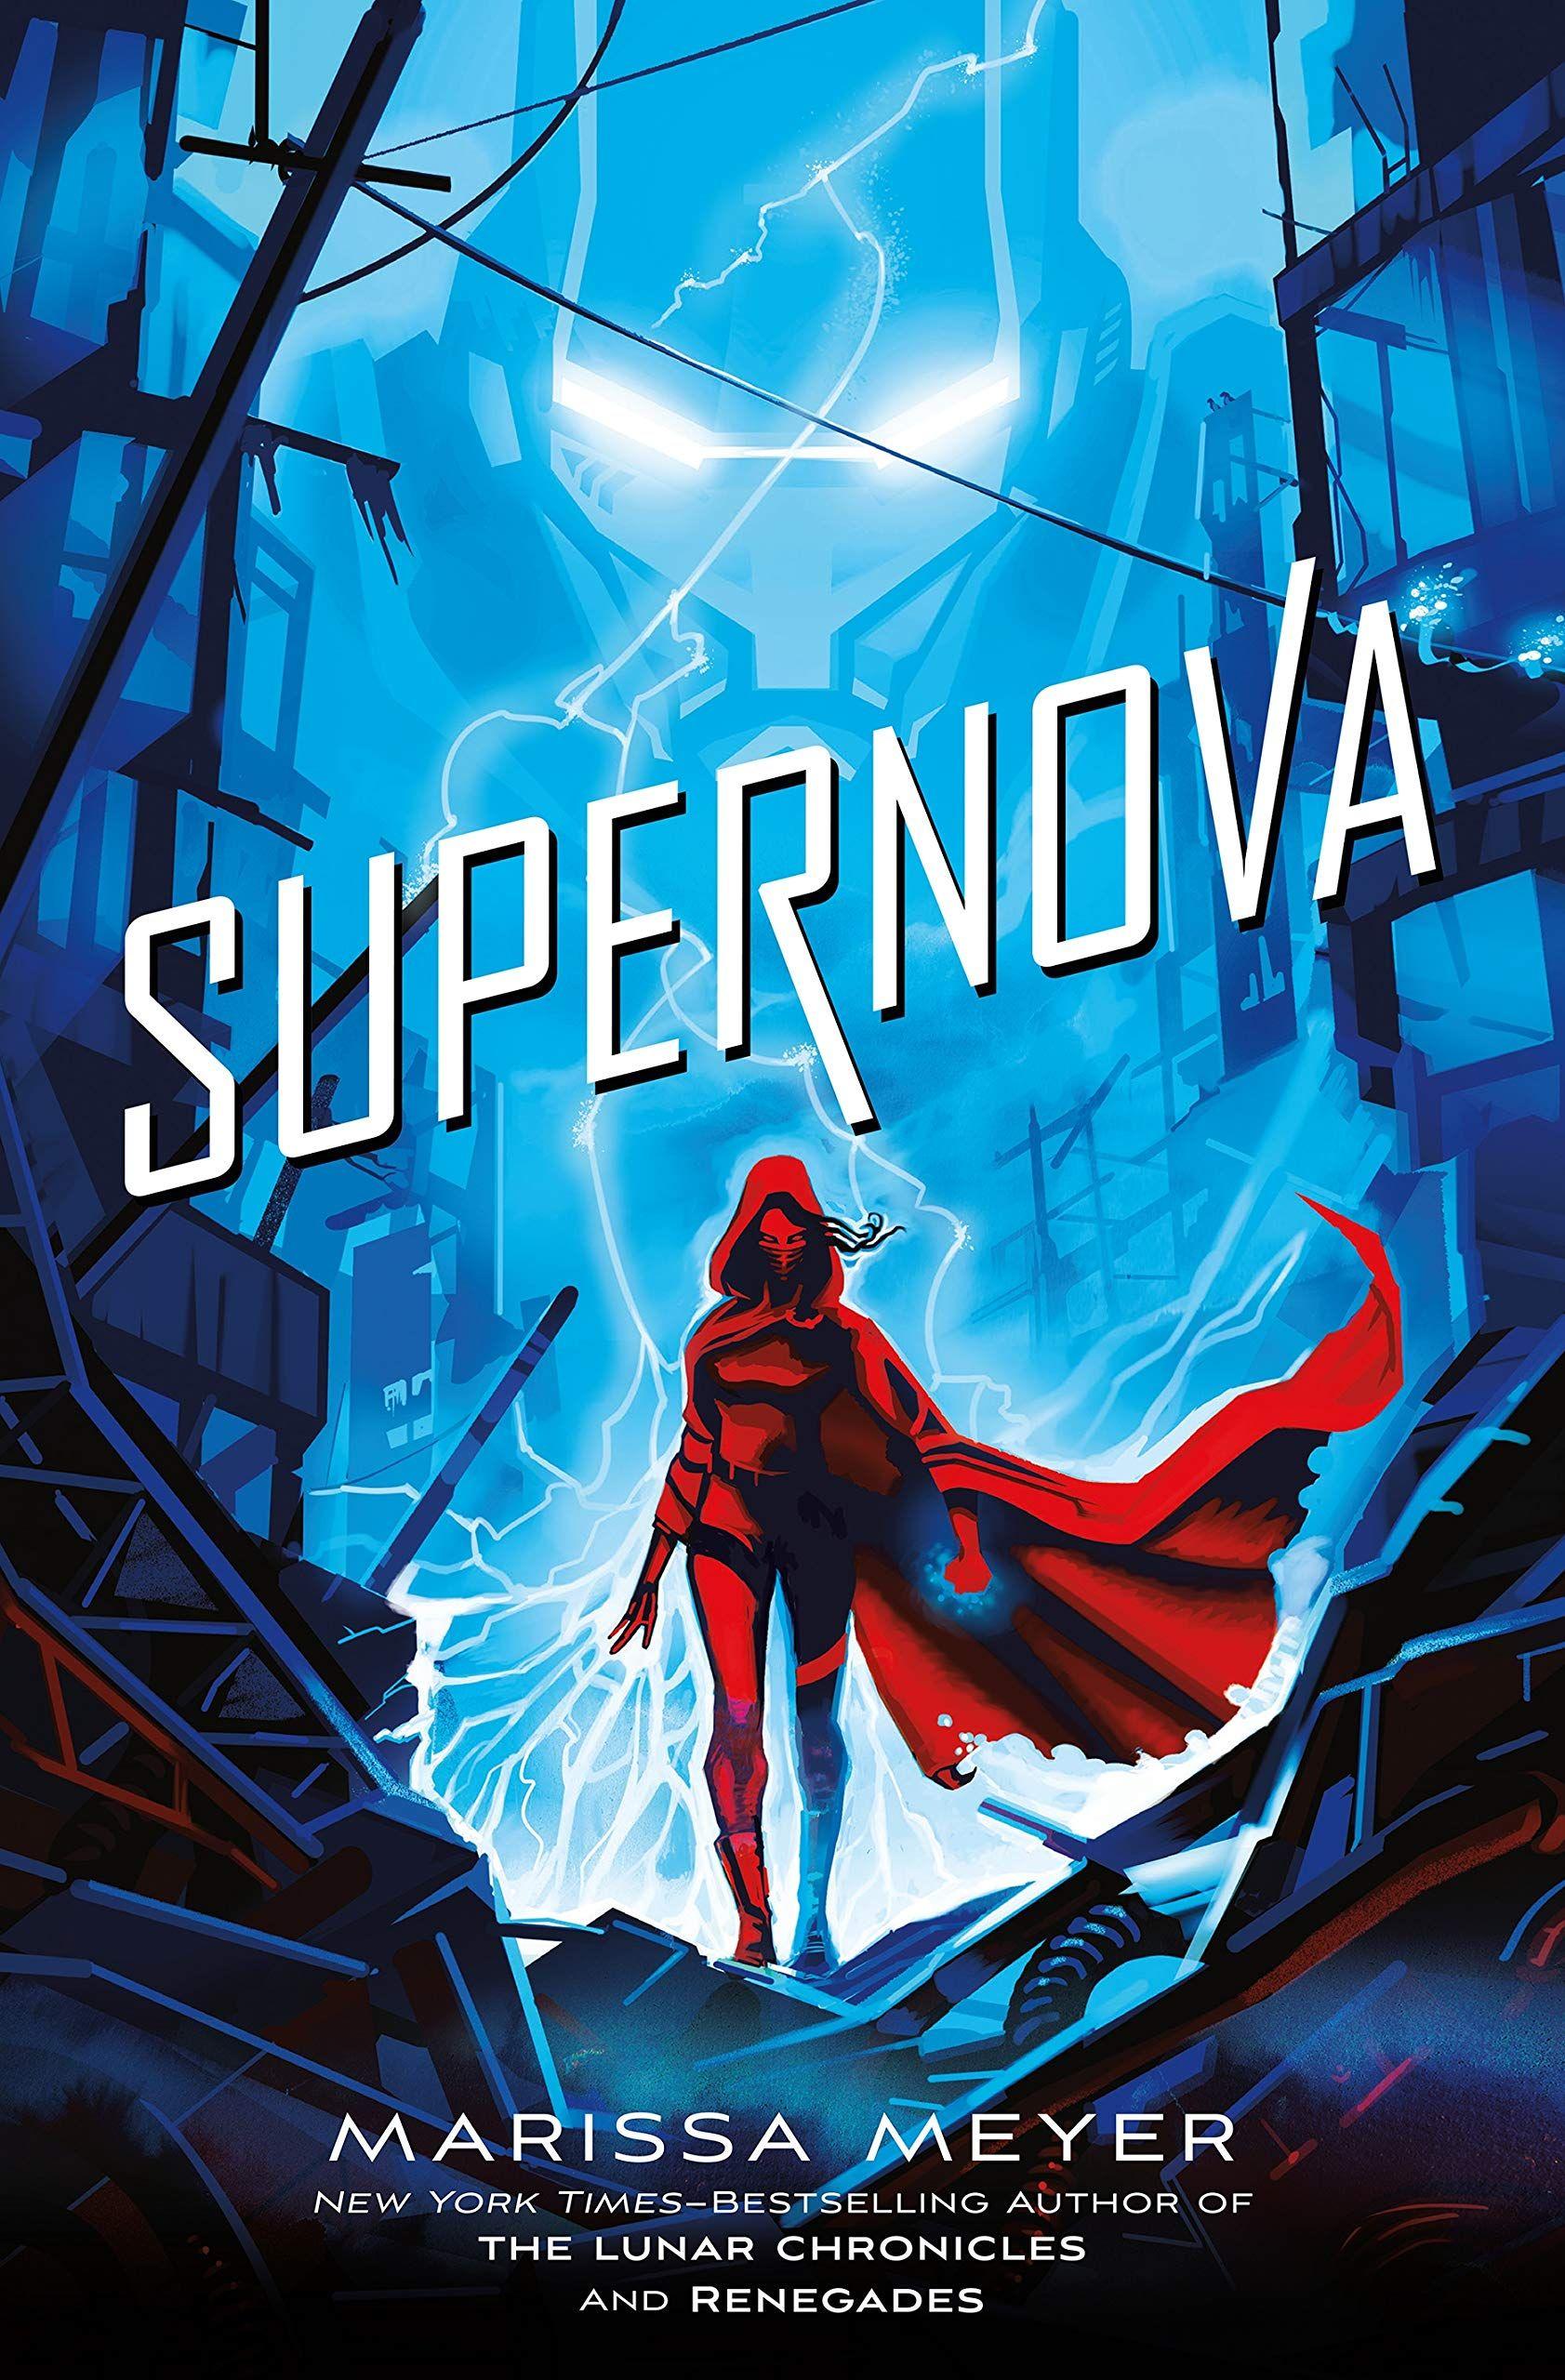 Marissa Meyer Wraps Up Renegades Trilogy In Exclusive Supernova